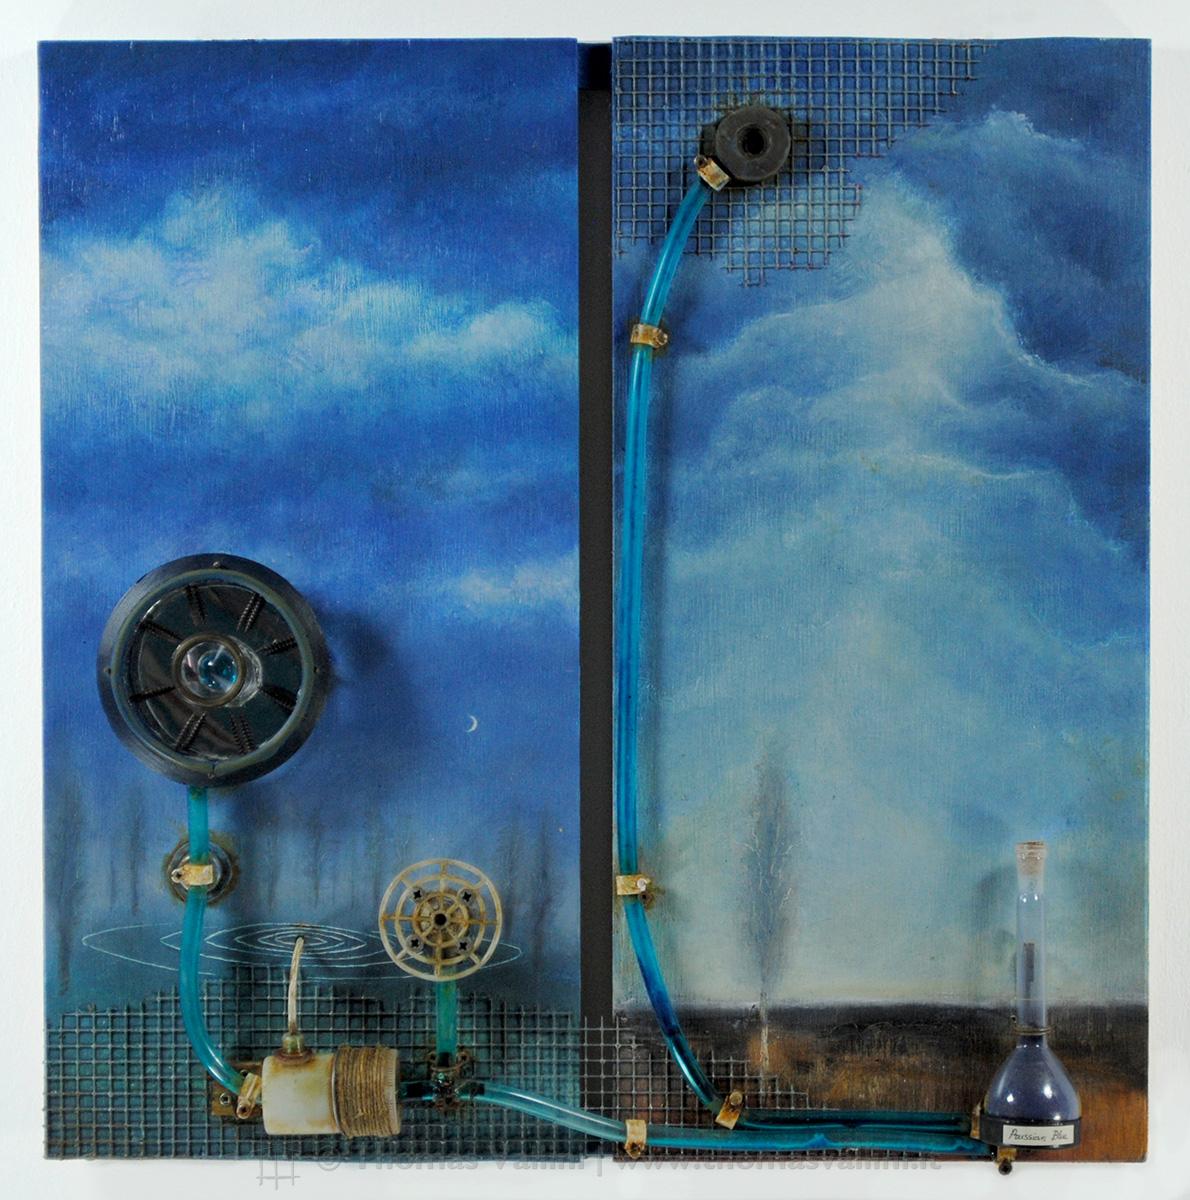 ZOOM - Blu (Turbina Cromoestrattiva)